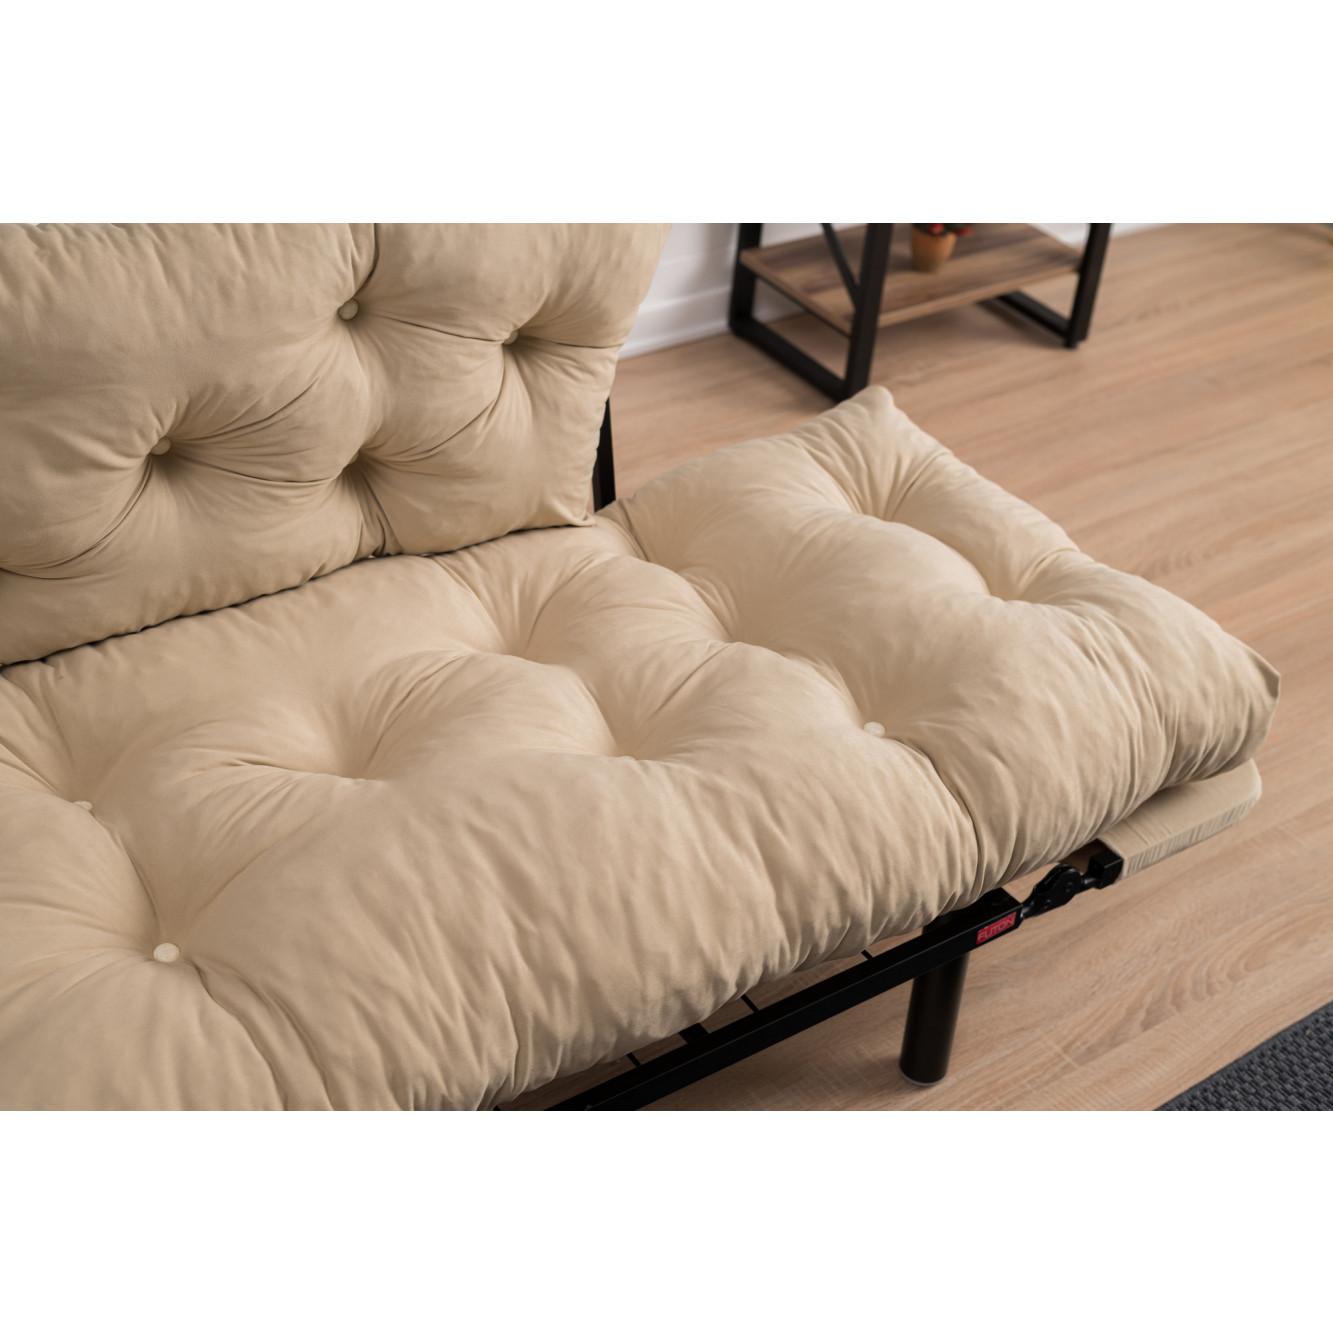 2-Sitz-Sofabett Nitta | Creme